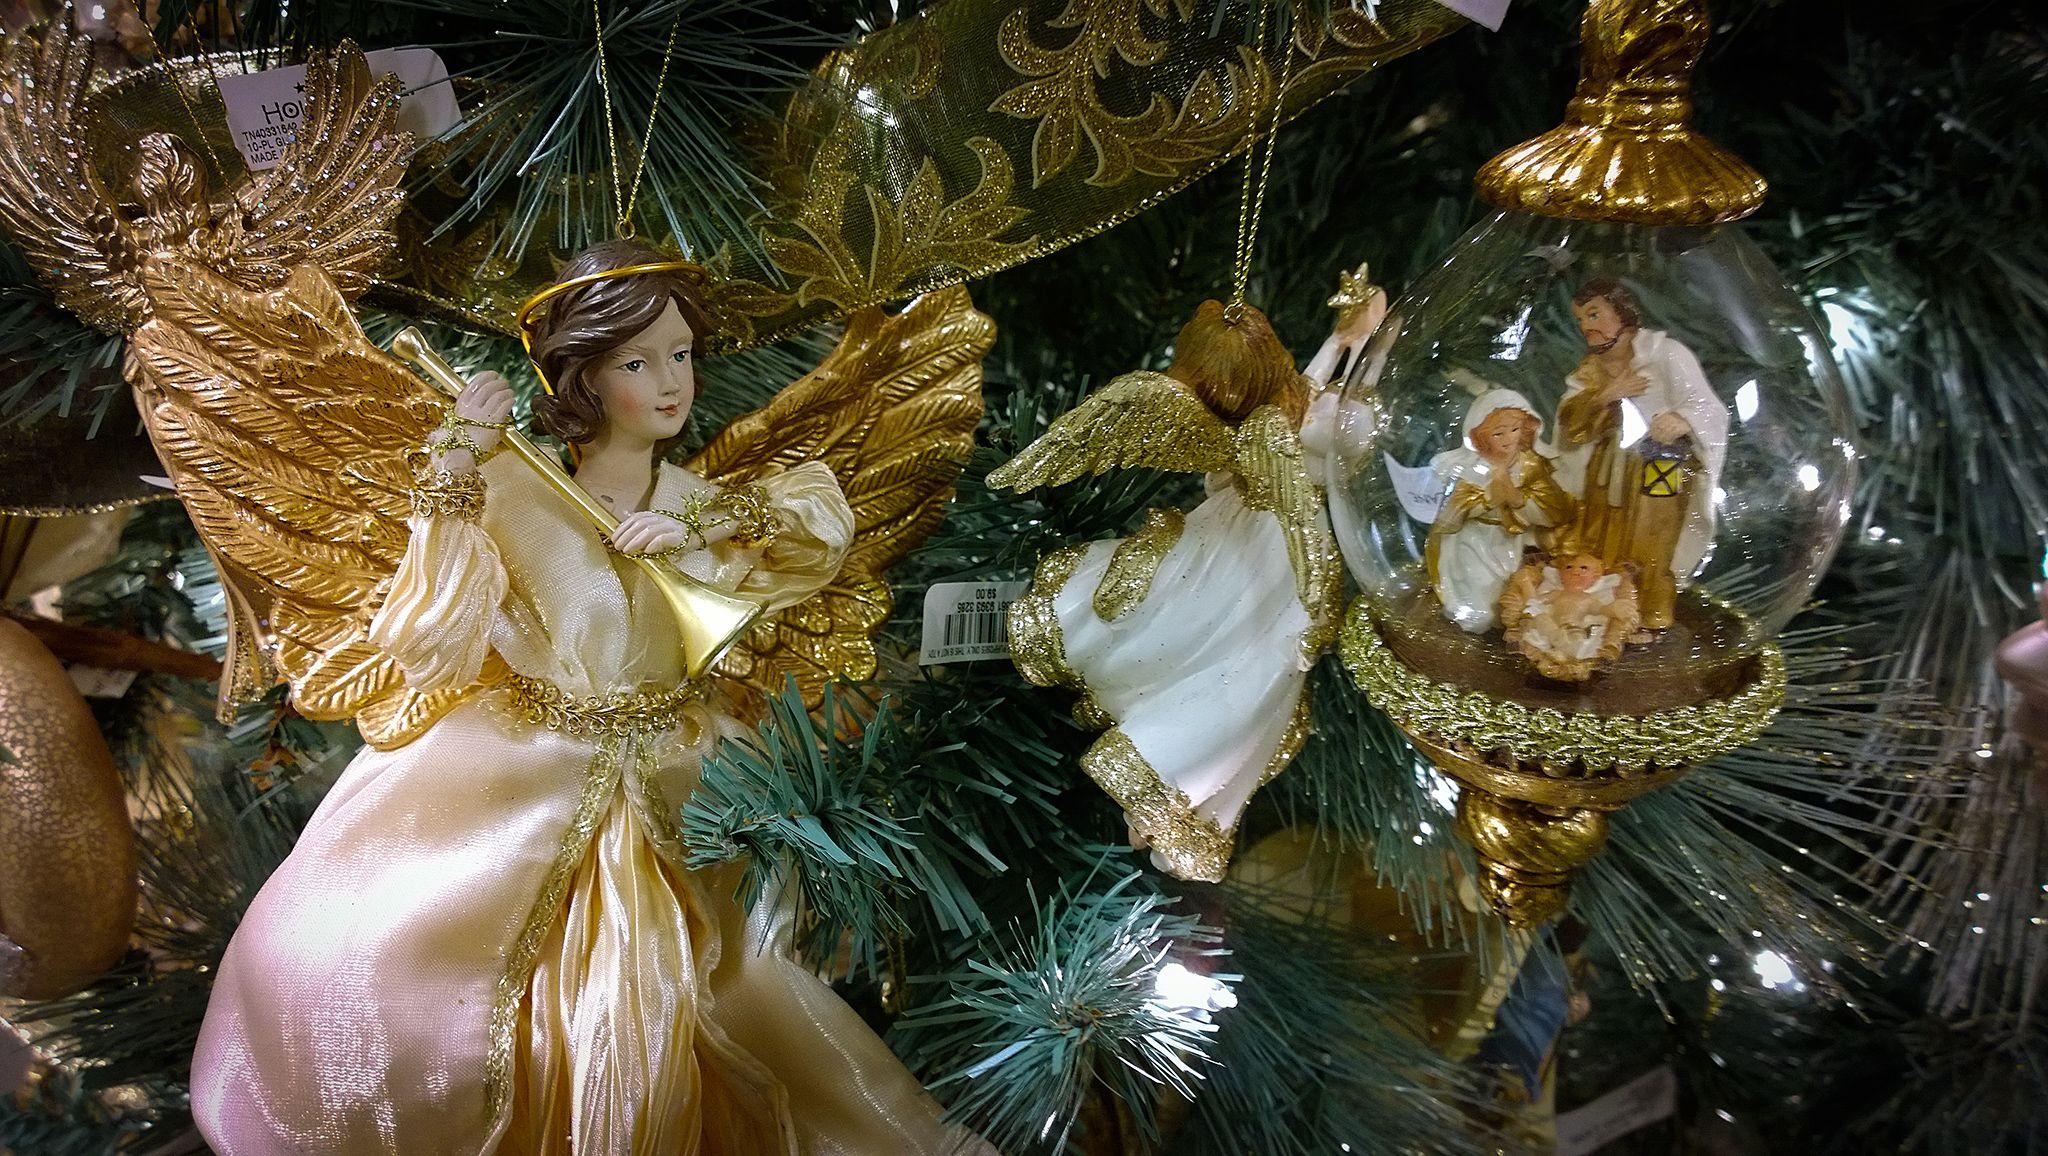 Christmas Decoration 2014 macy's 2014 christmas tree themes - my decorative tree